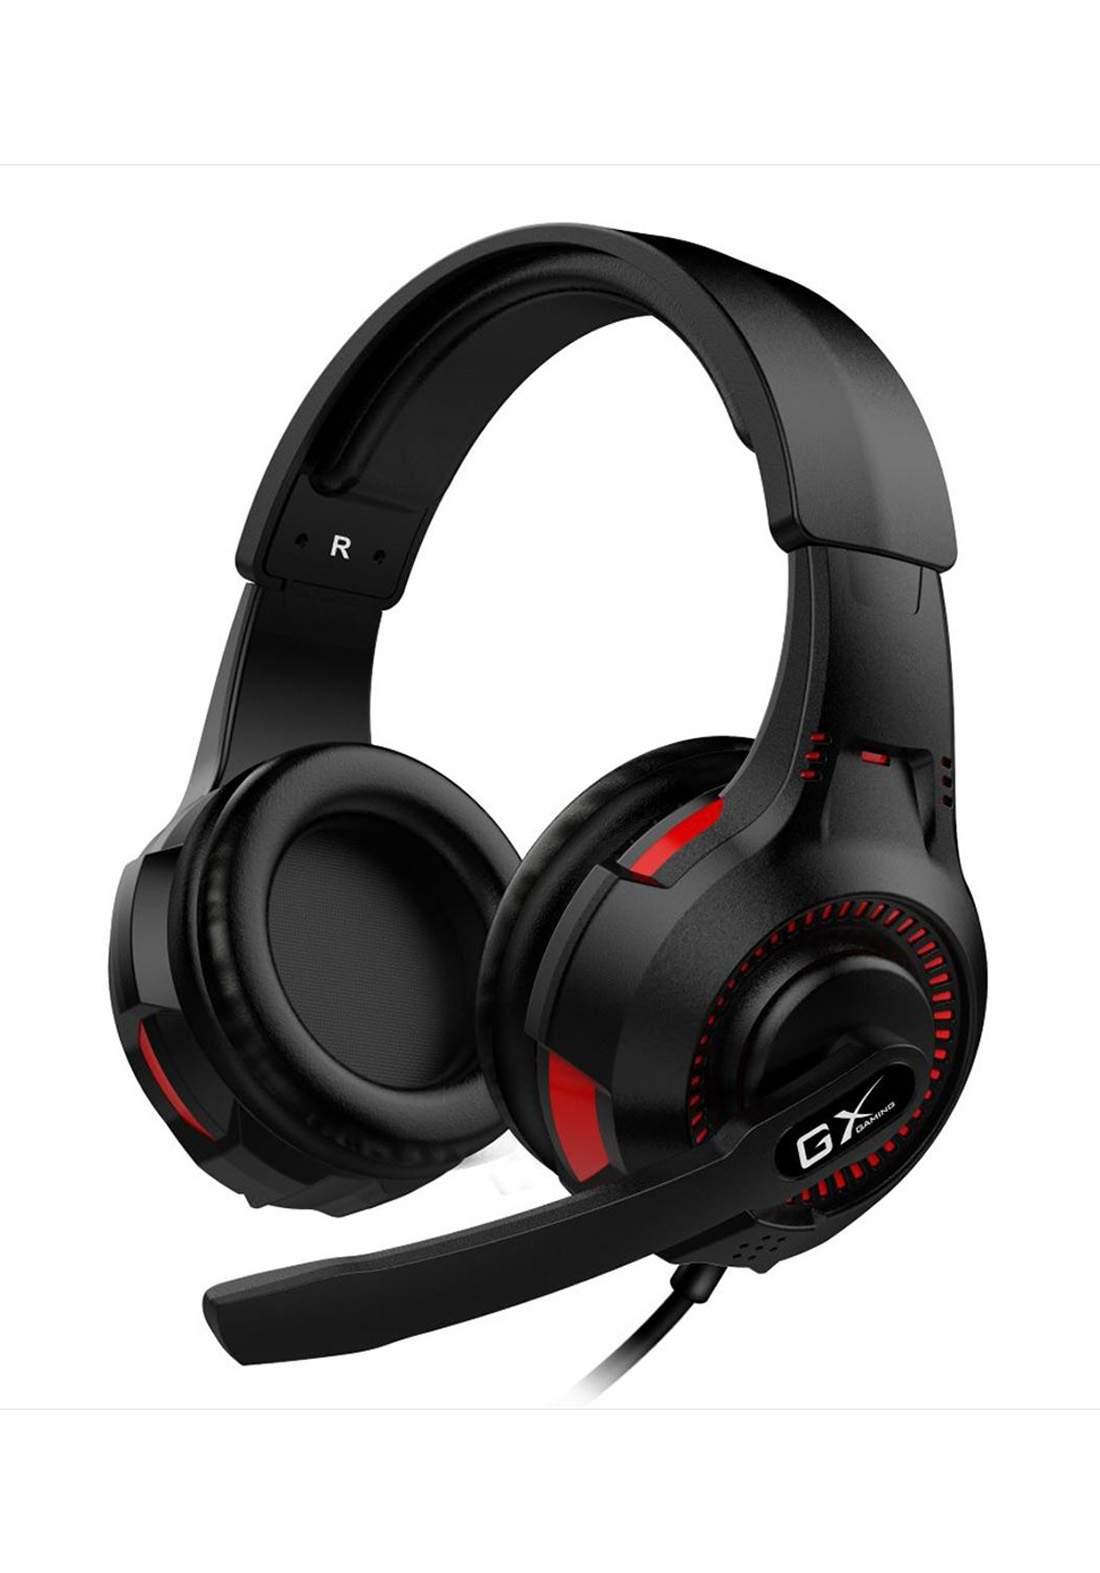 Genius GX HS-G600V Vibration Gaming Headset - Black سماعة